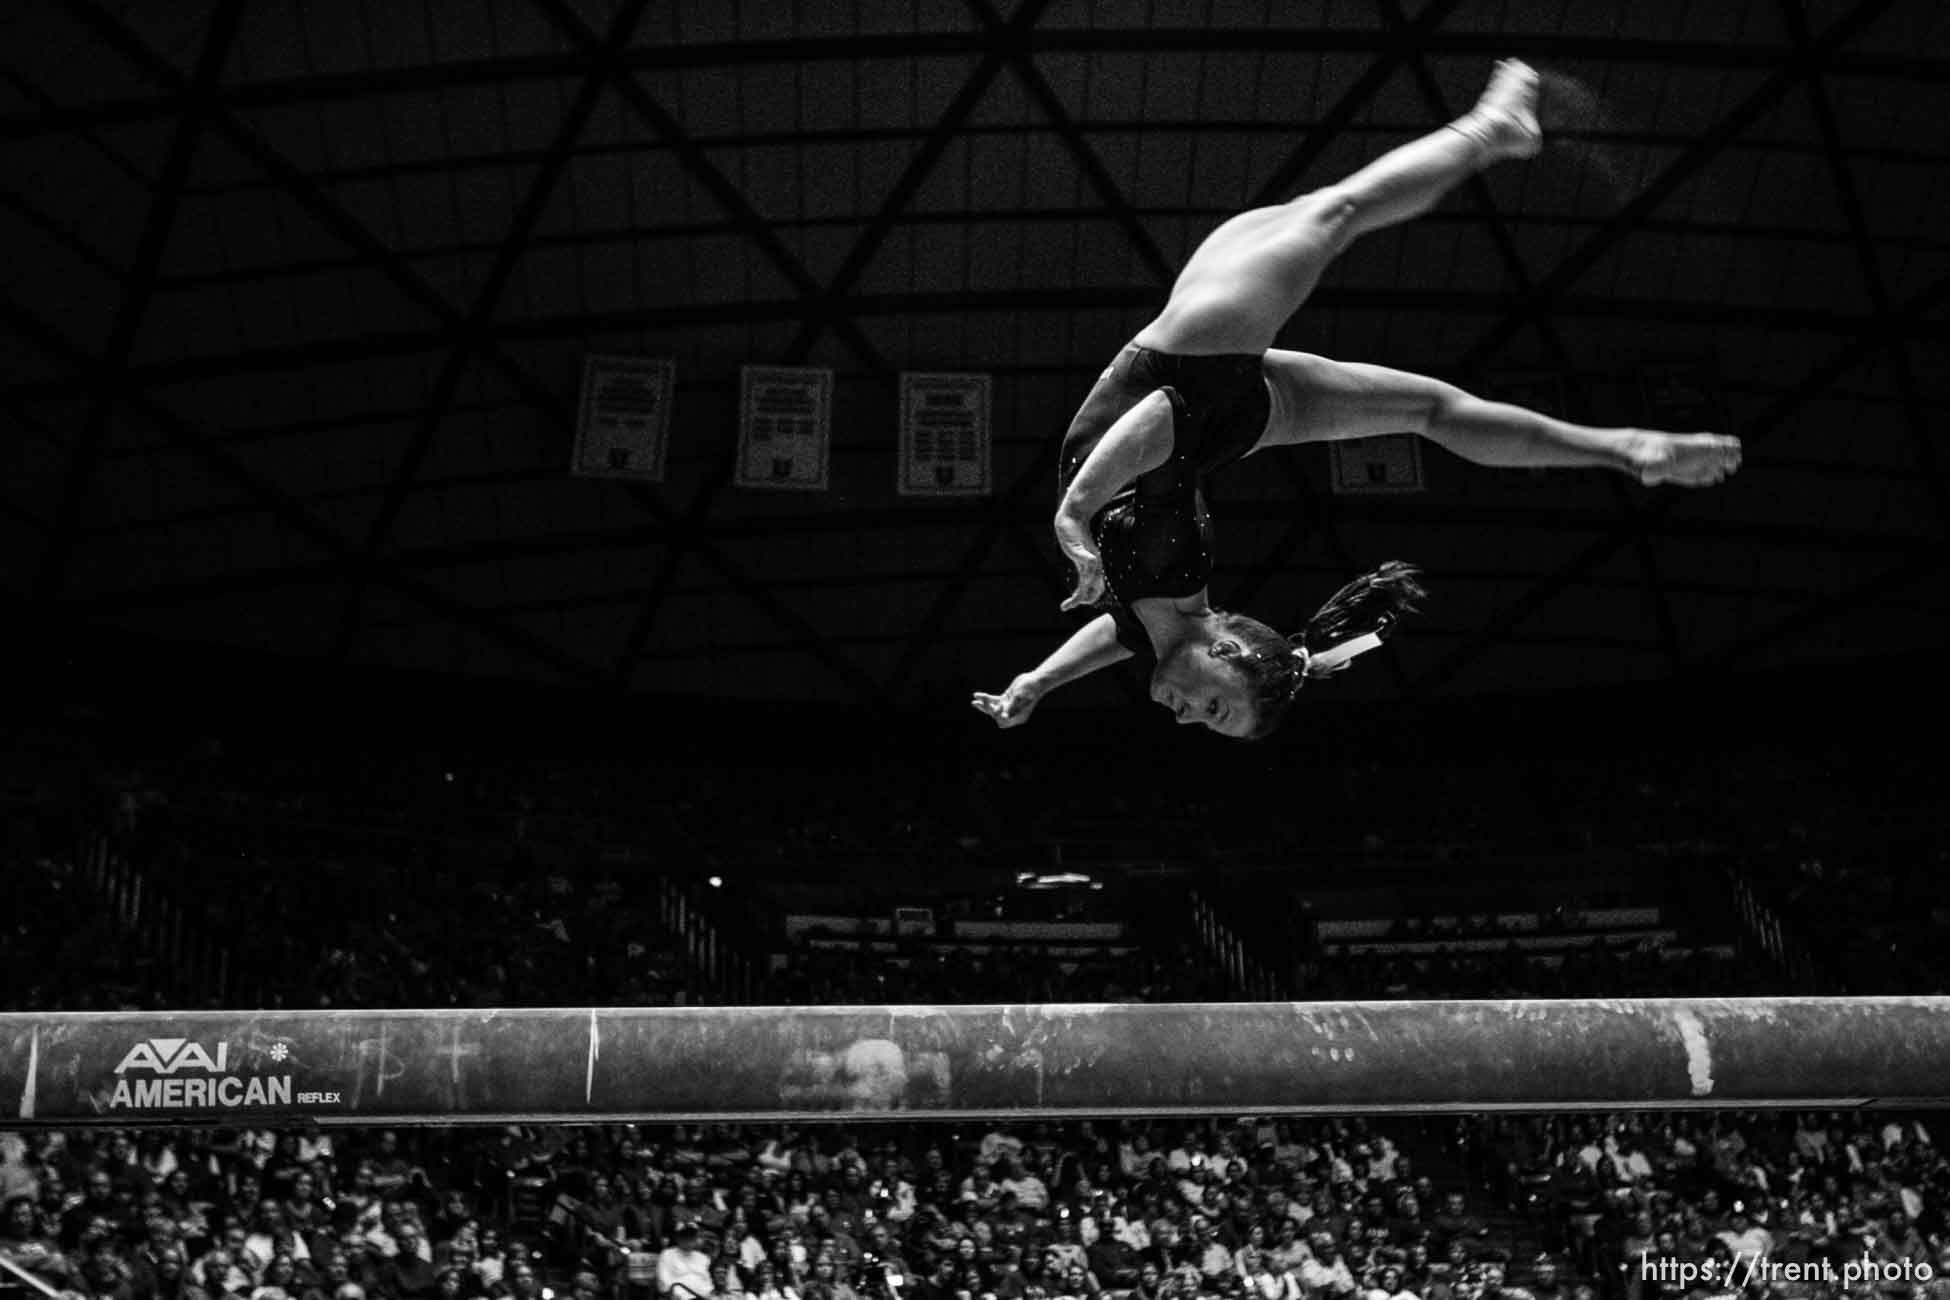 Utah's Nicolle Ford competes on the beam at University of Utah vs. Arizona State NCAA Women's gymnastics at the Huntsman Center.